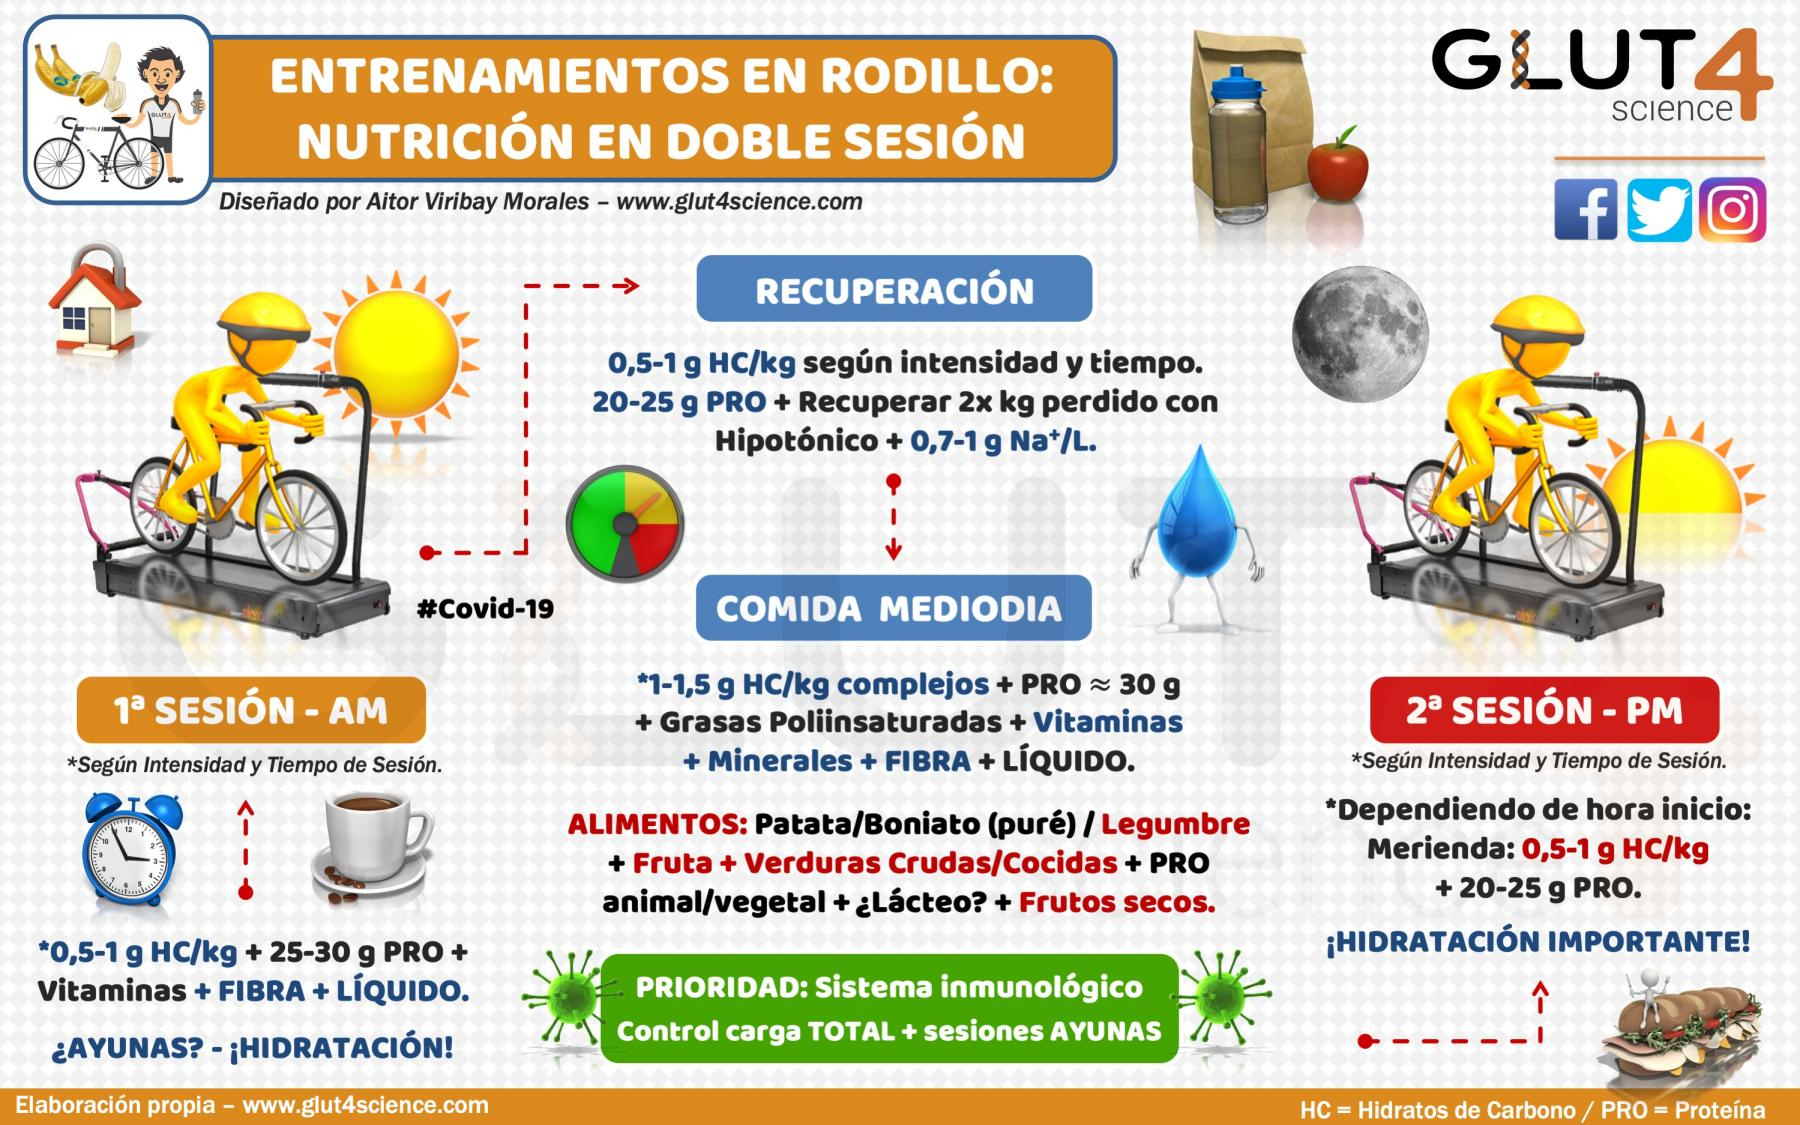 Nutrición Entrenamiento Rodillo Doble Sesión